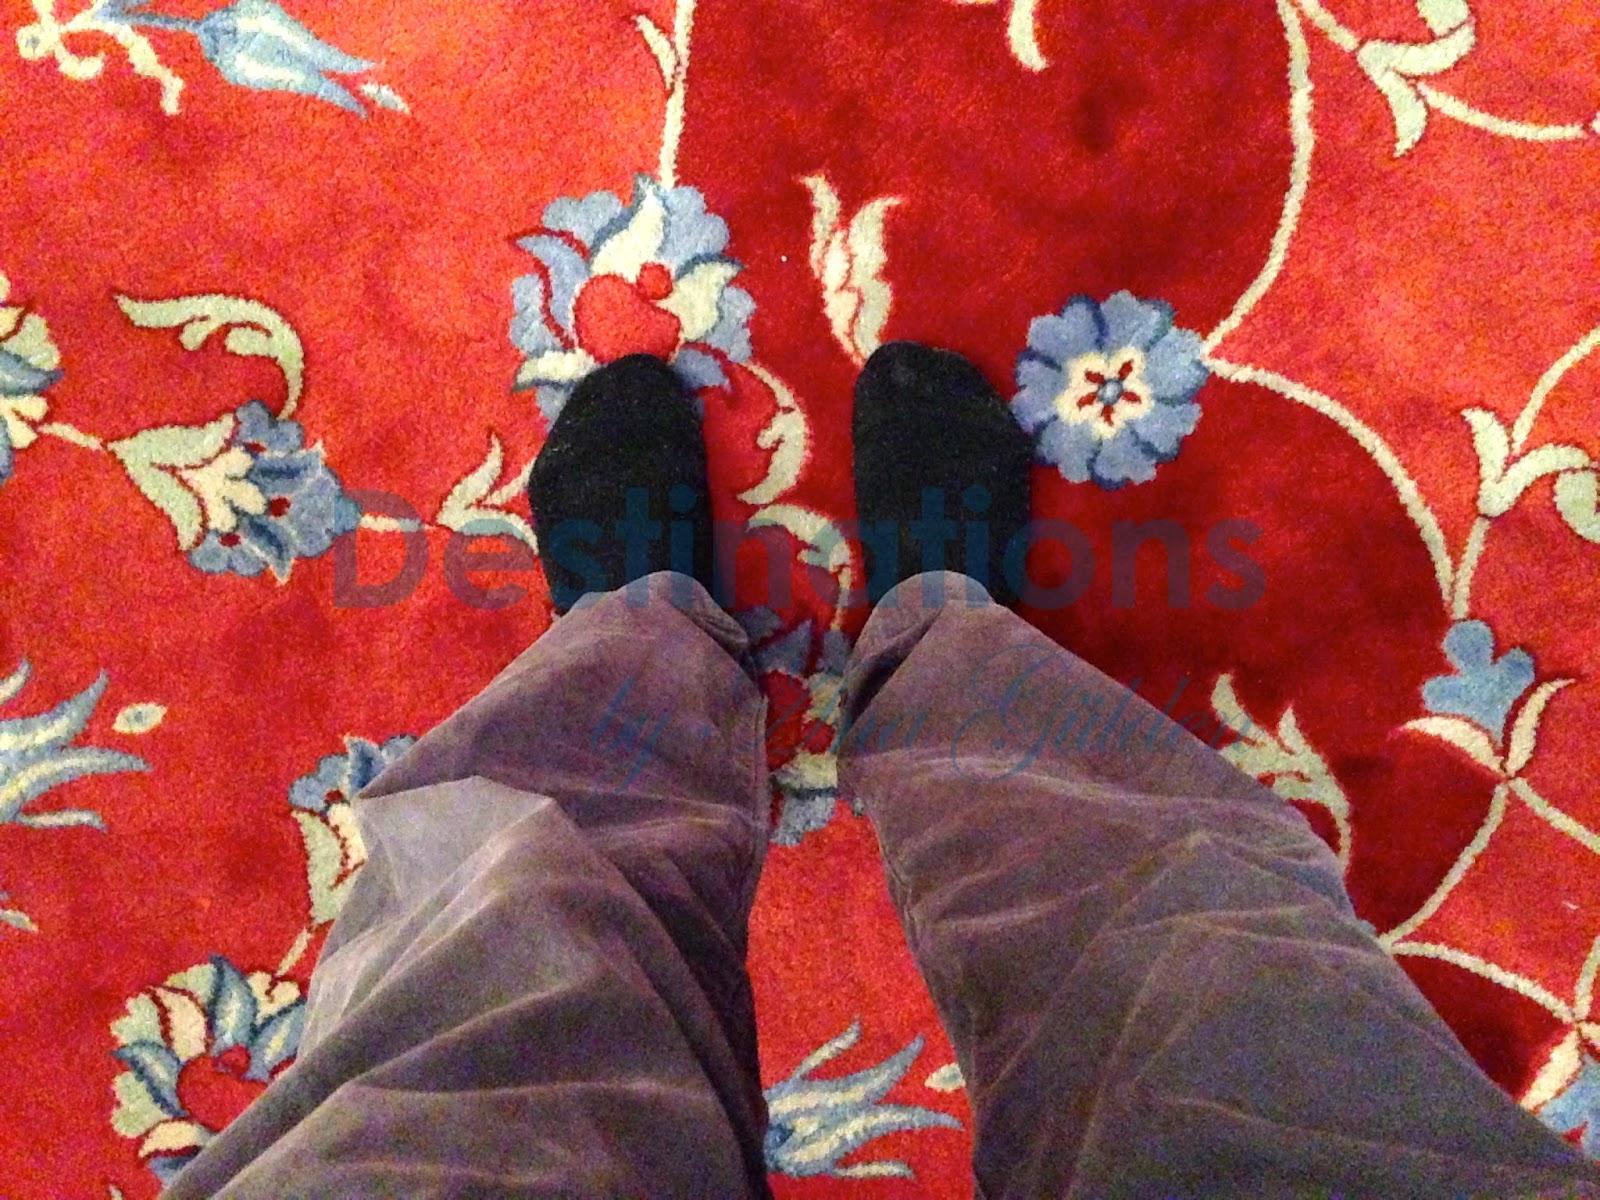 Turcas Mezquitas Casa Costumbres Zapatos Quitarse Los En dzCdOUqw